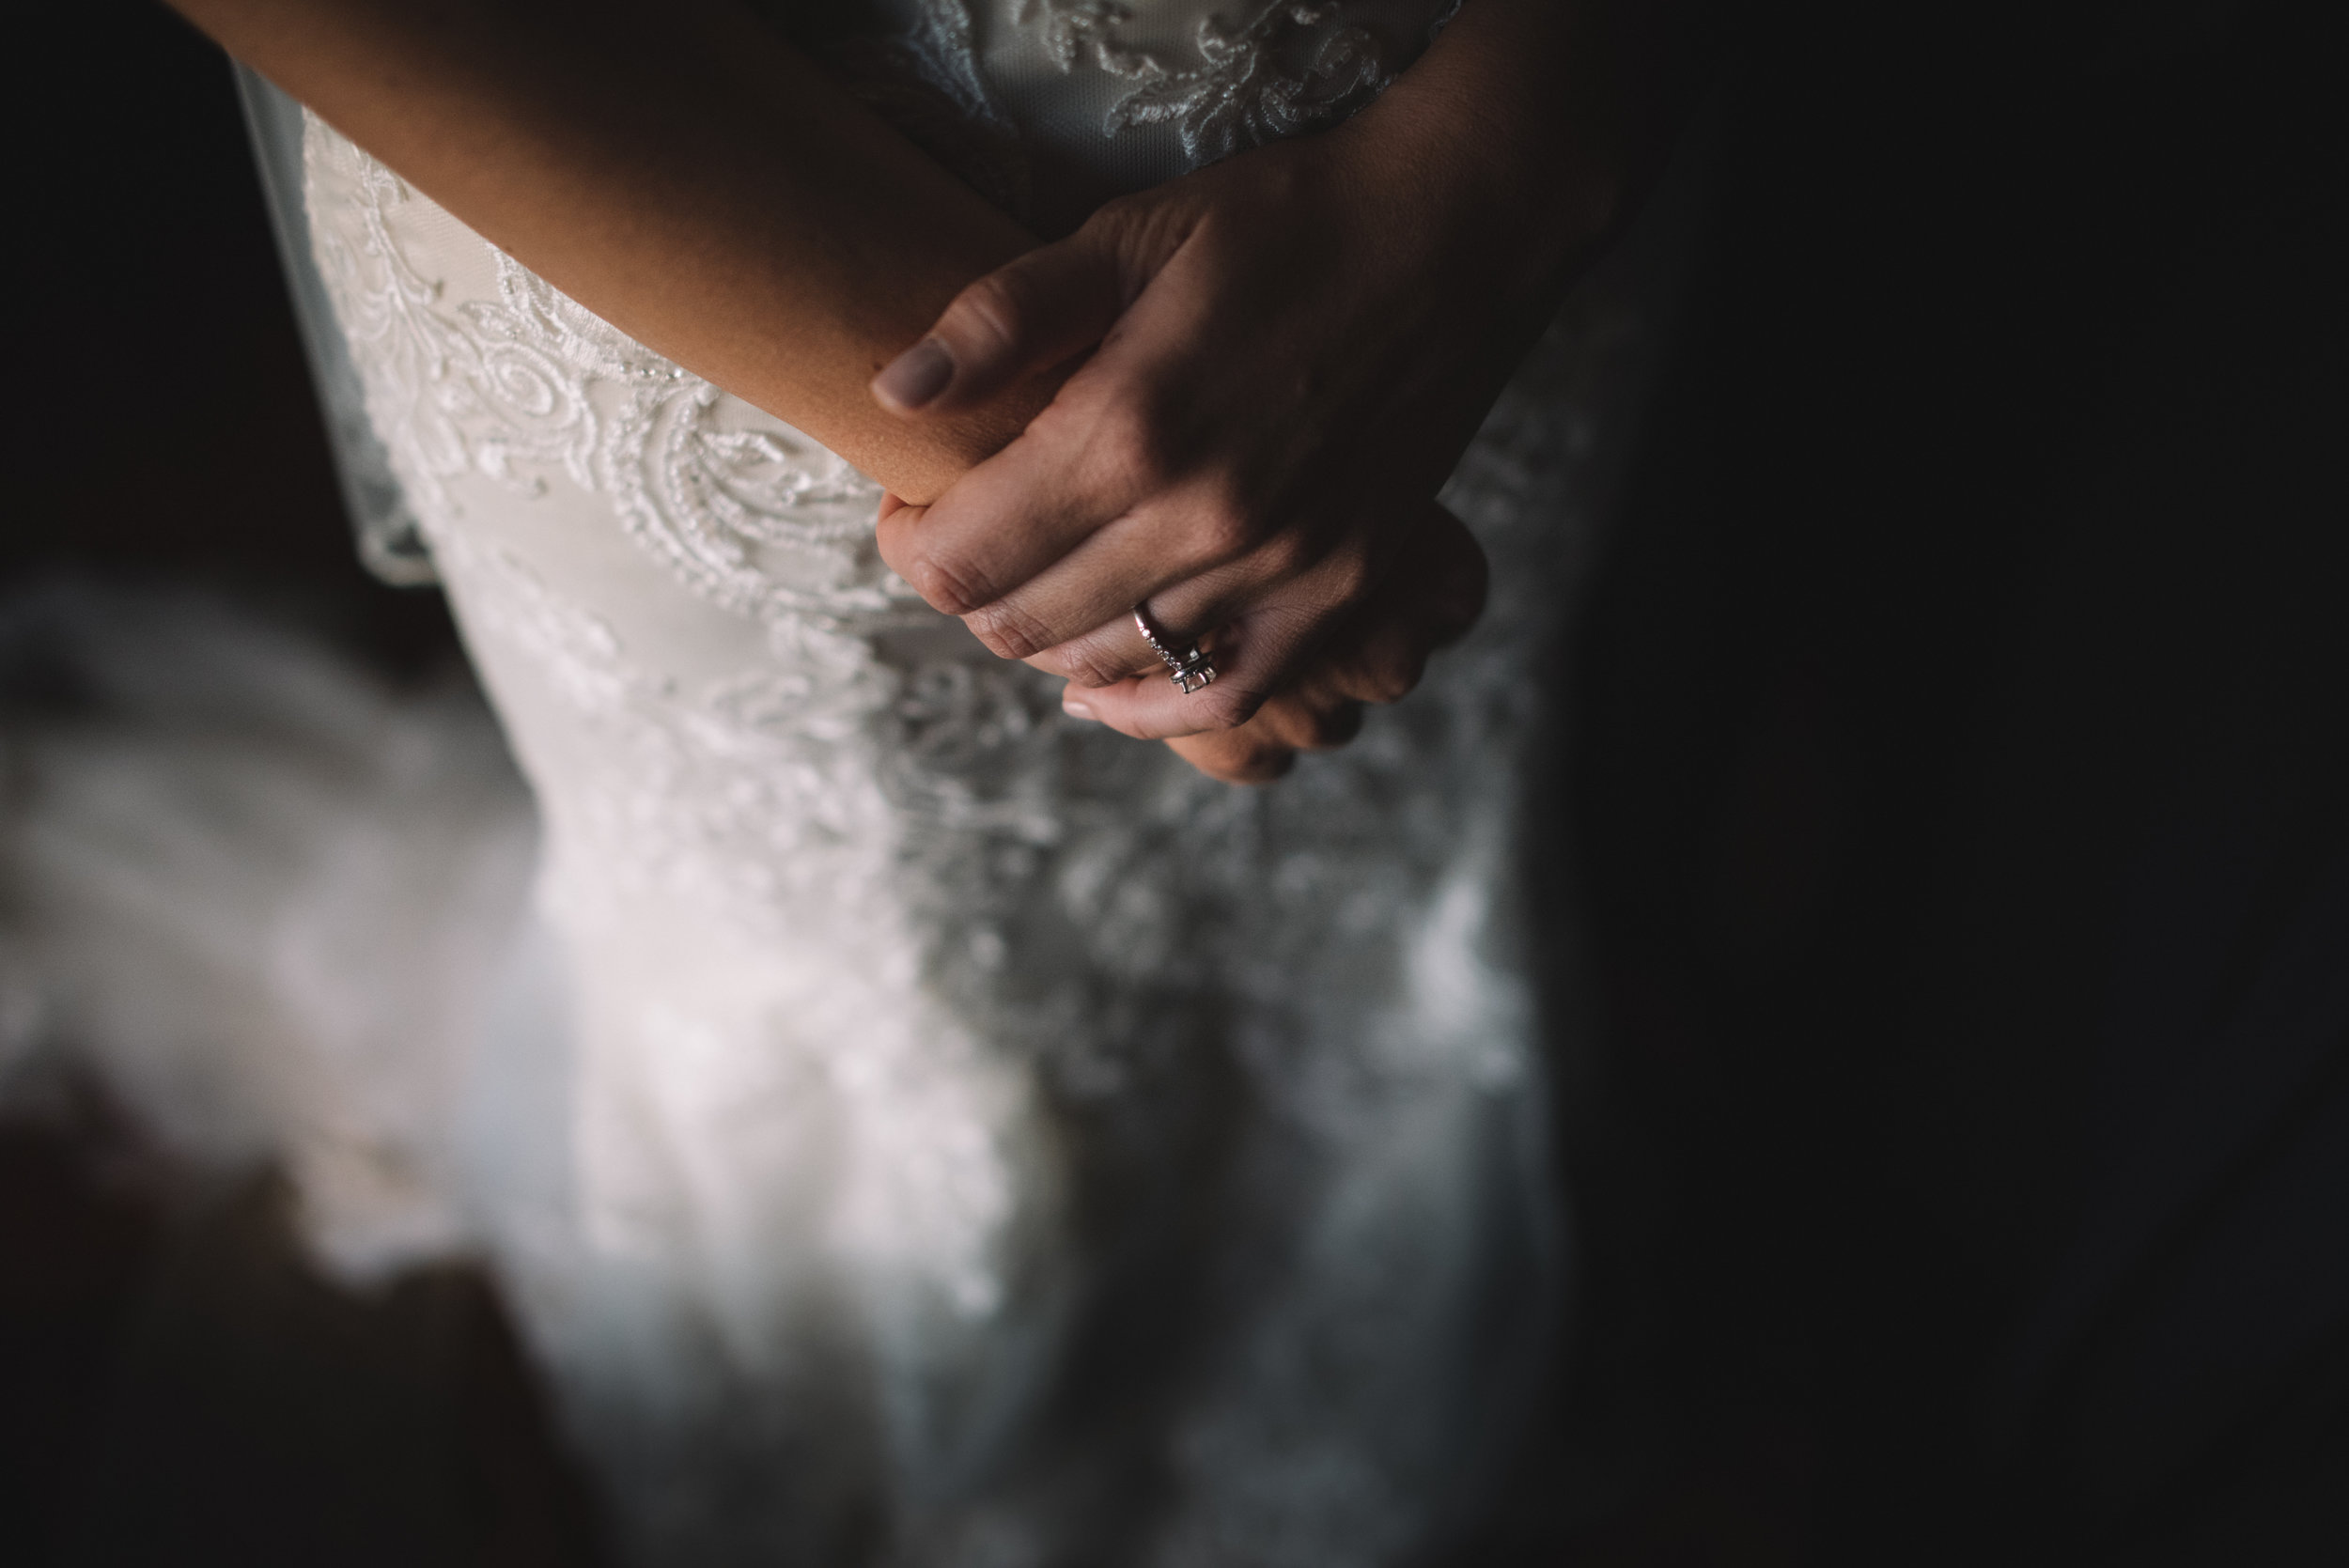 WeddingPhotos | NJPhotographer | Highlights-1-2.jpg